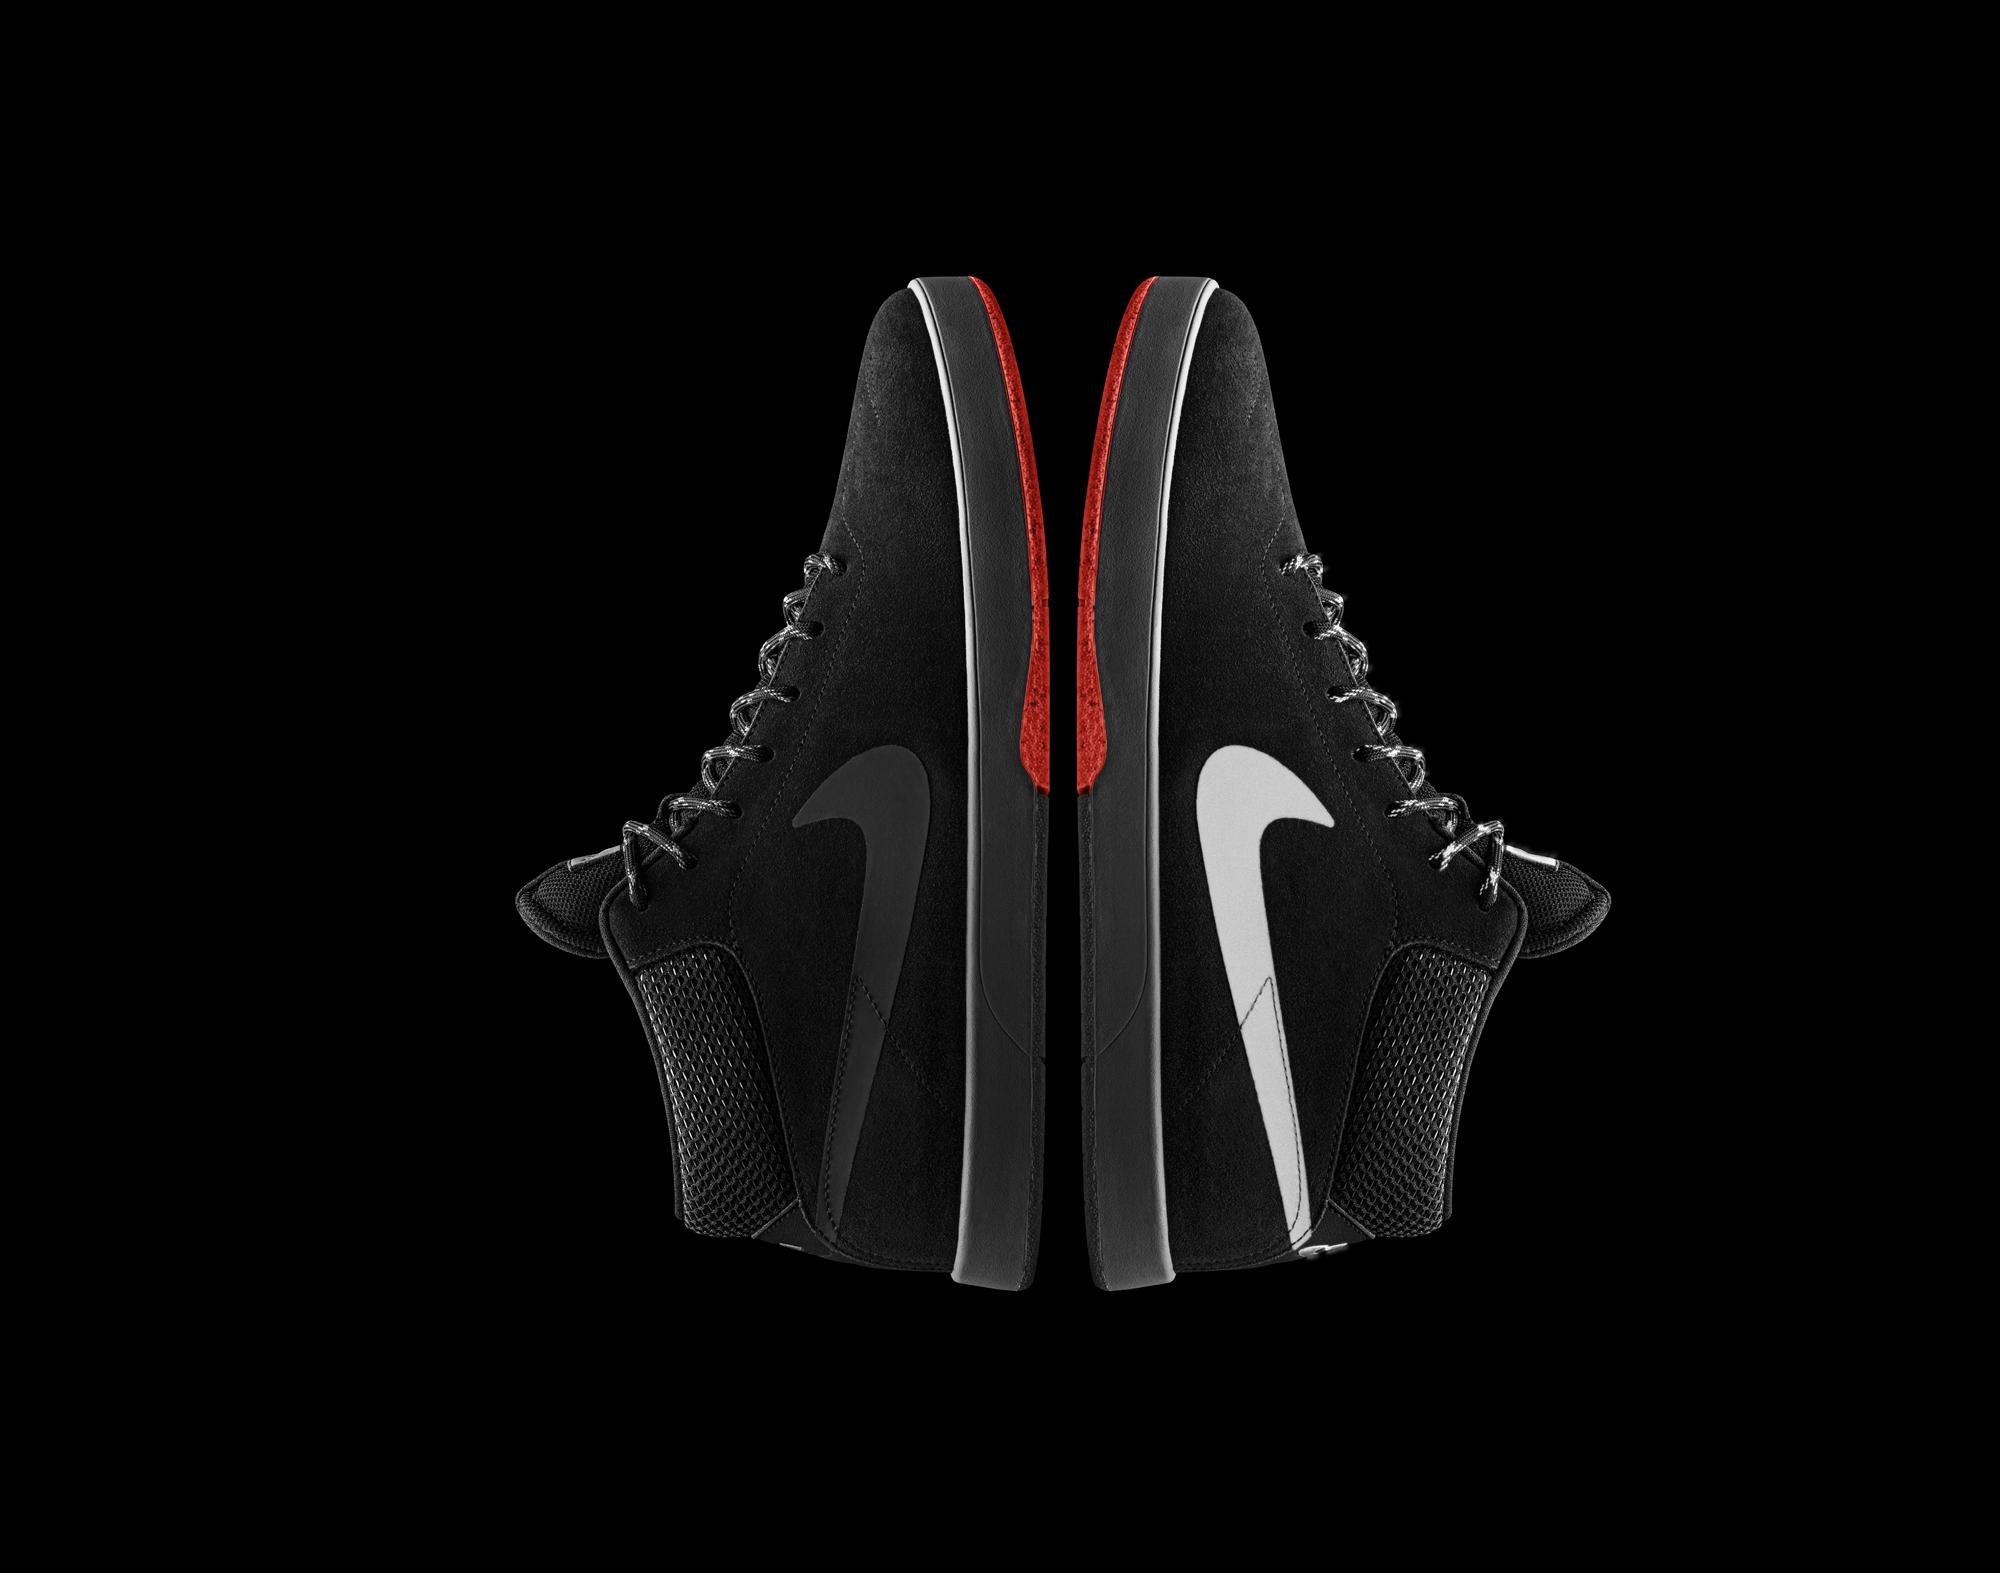 Nike_SB_HO14_FlashPack_Koston_Butterfly_33397